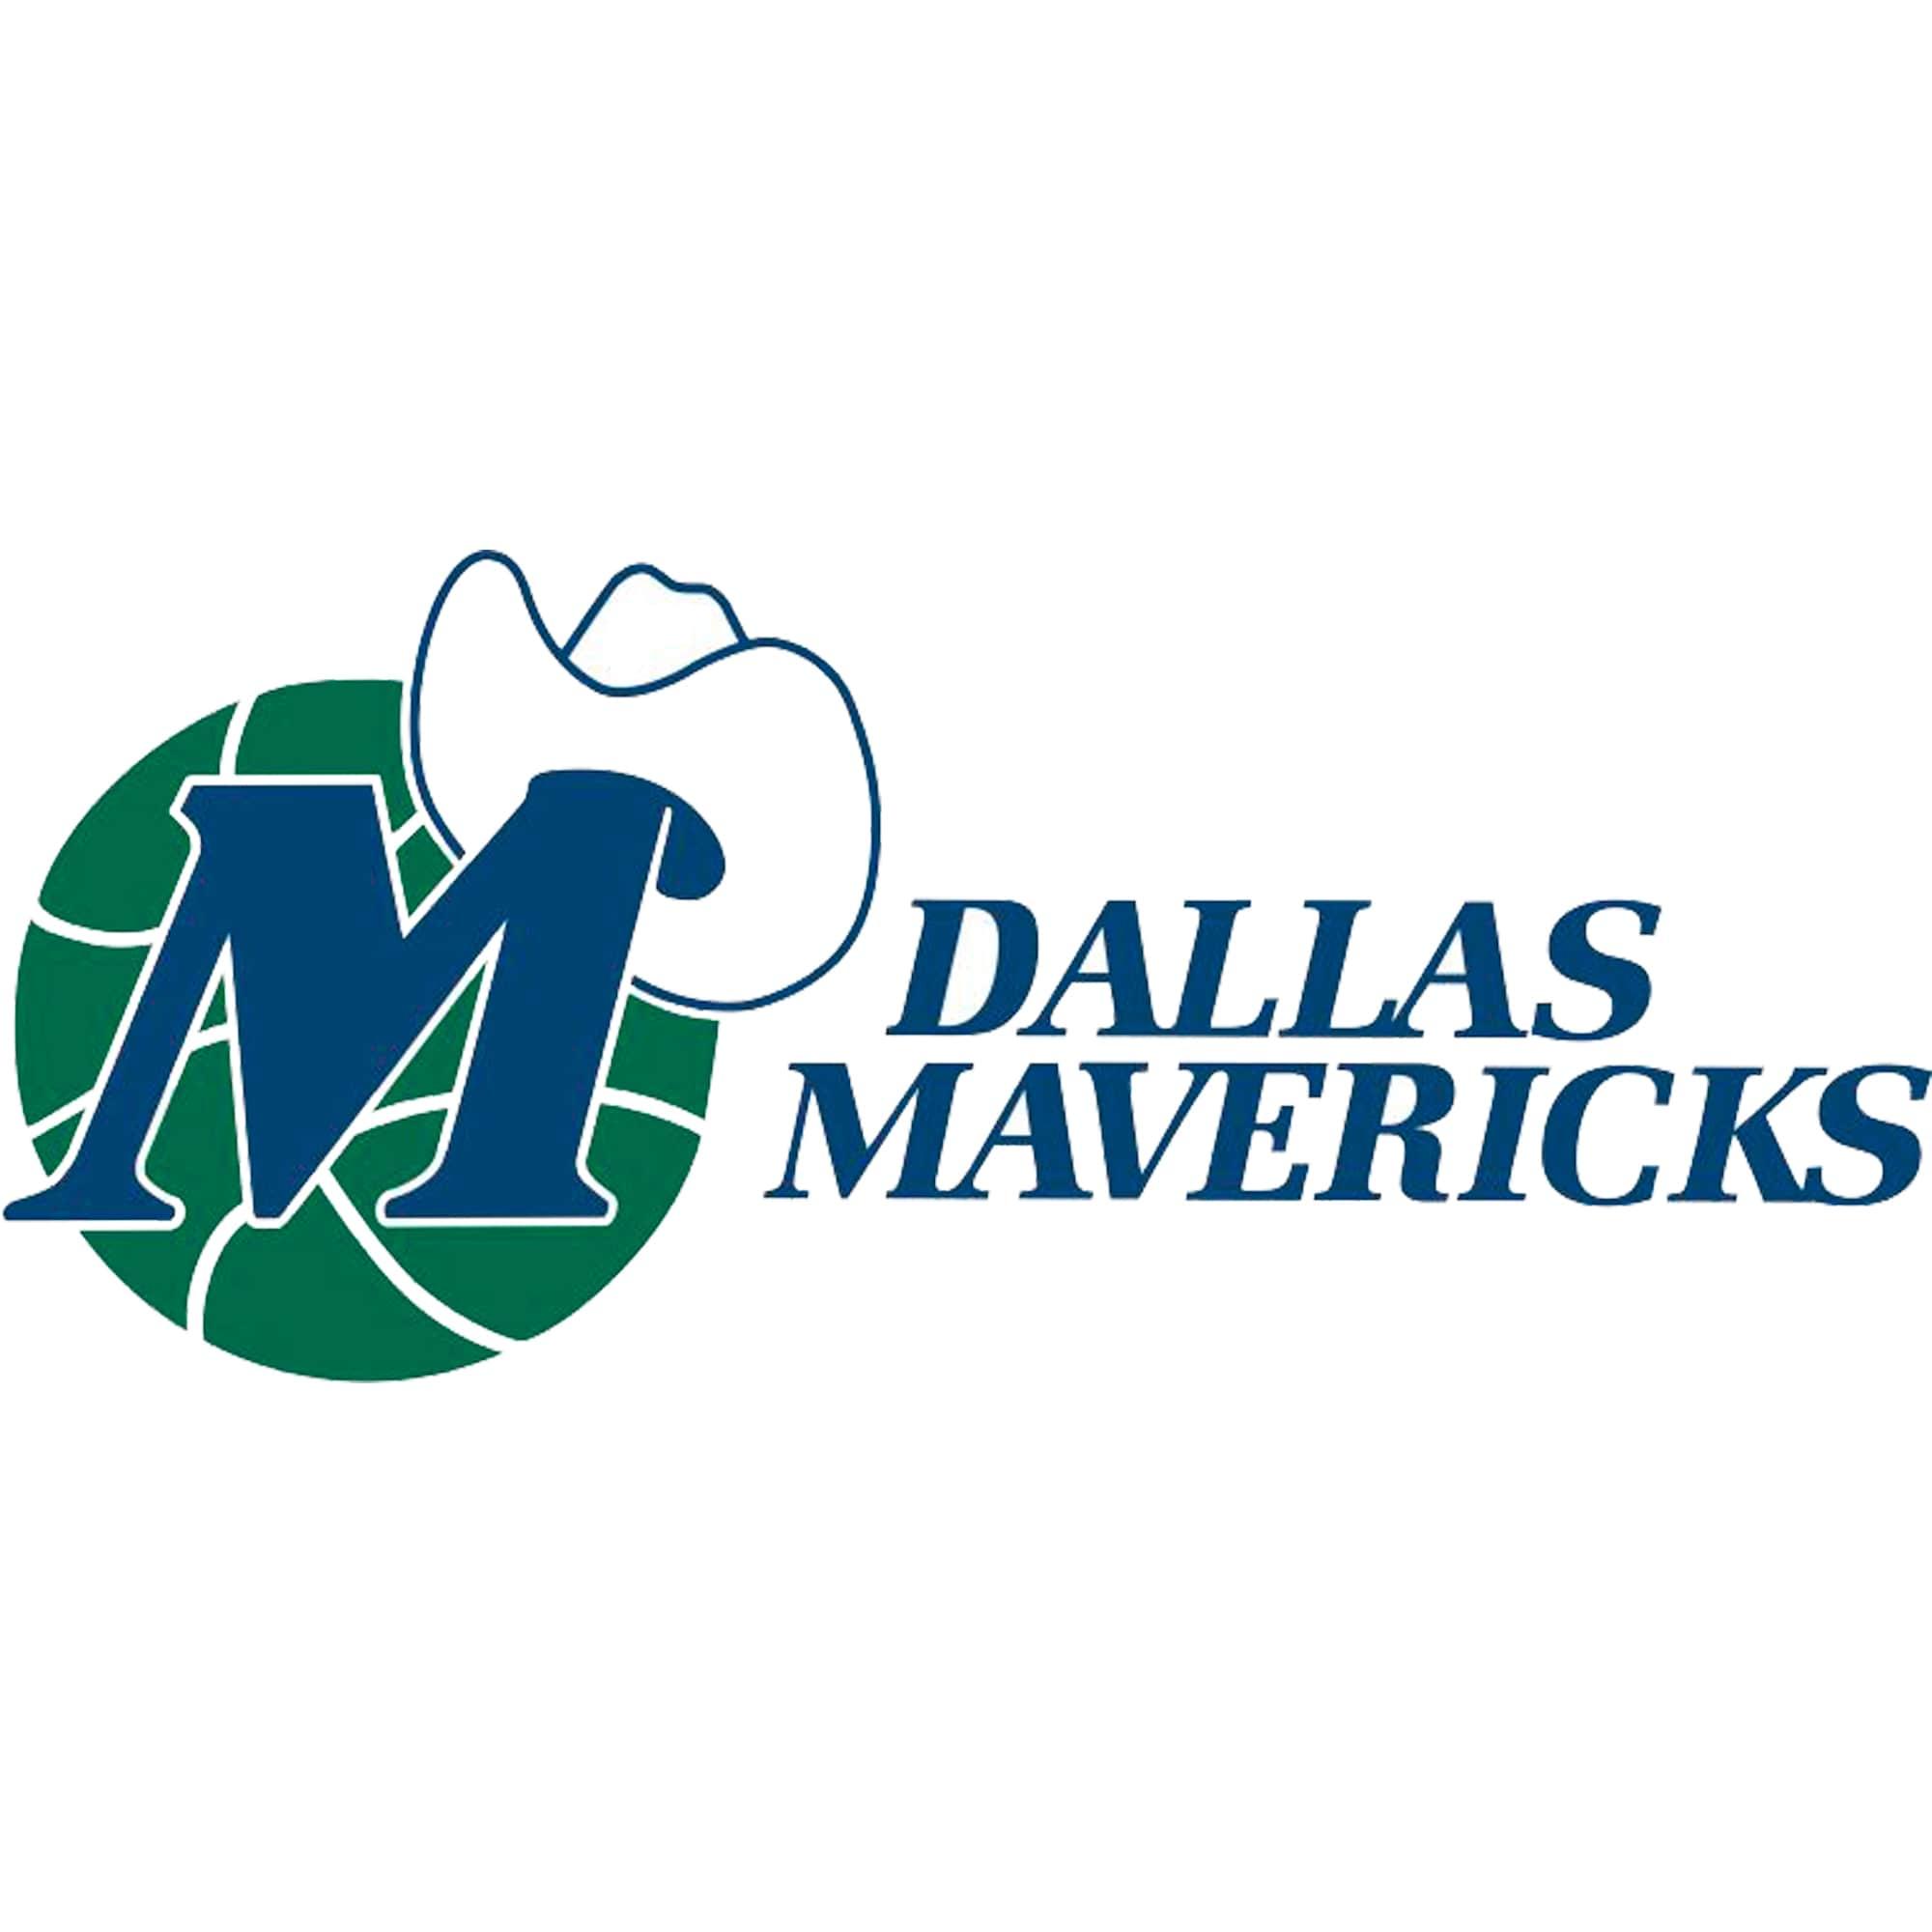 Dallas Mavericks Fathead Giant Removable Decal